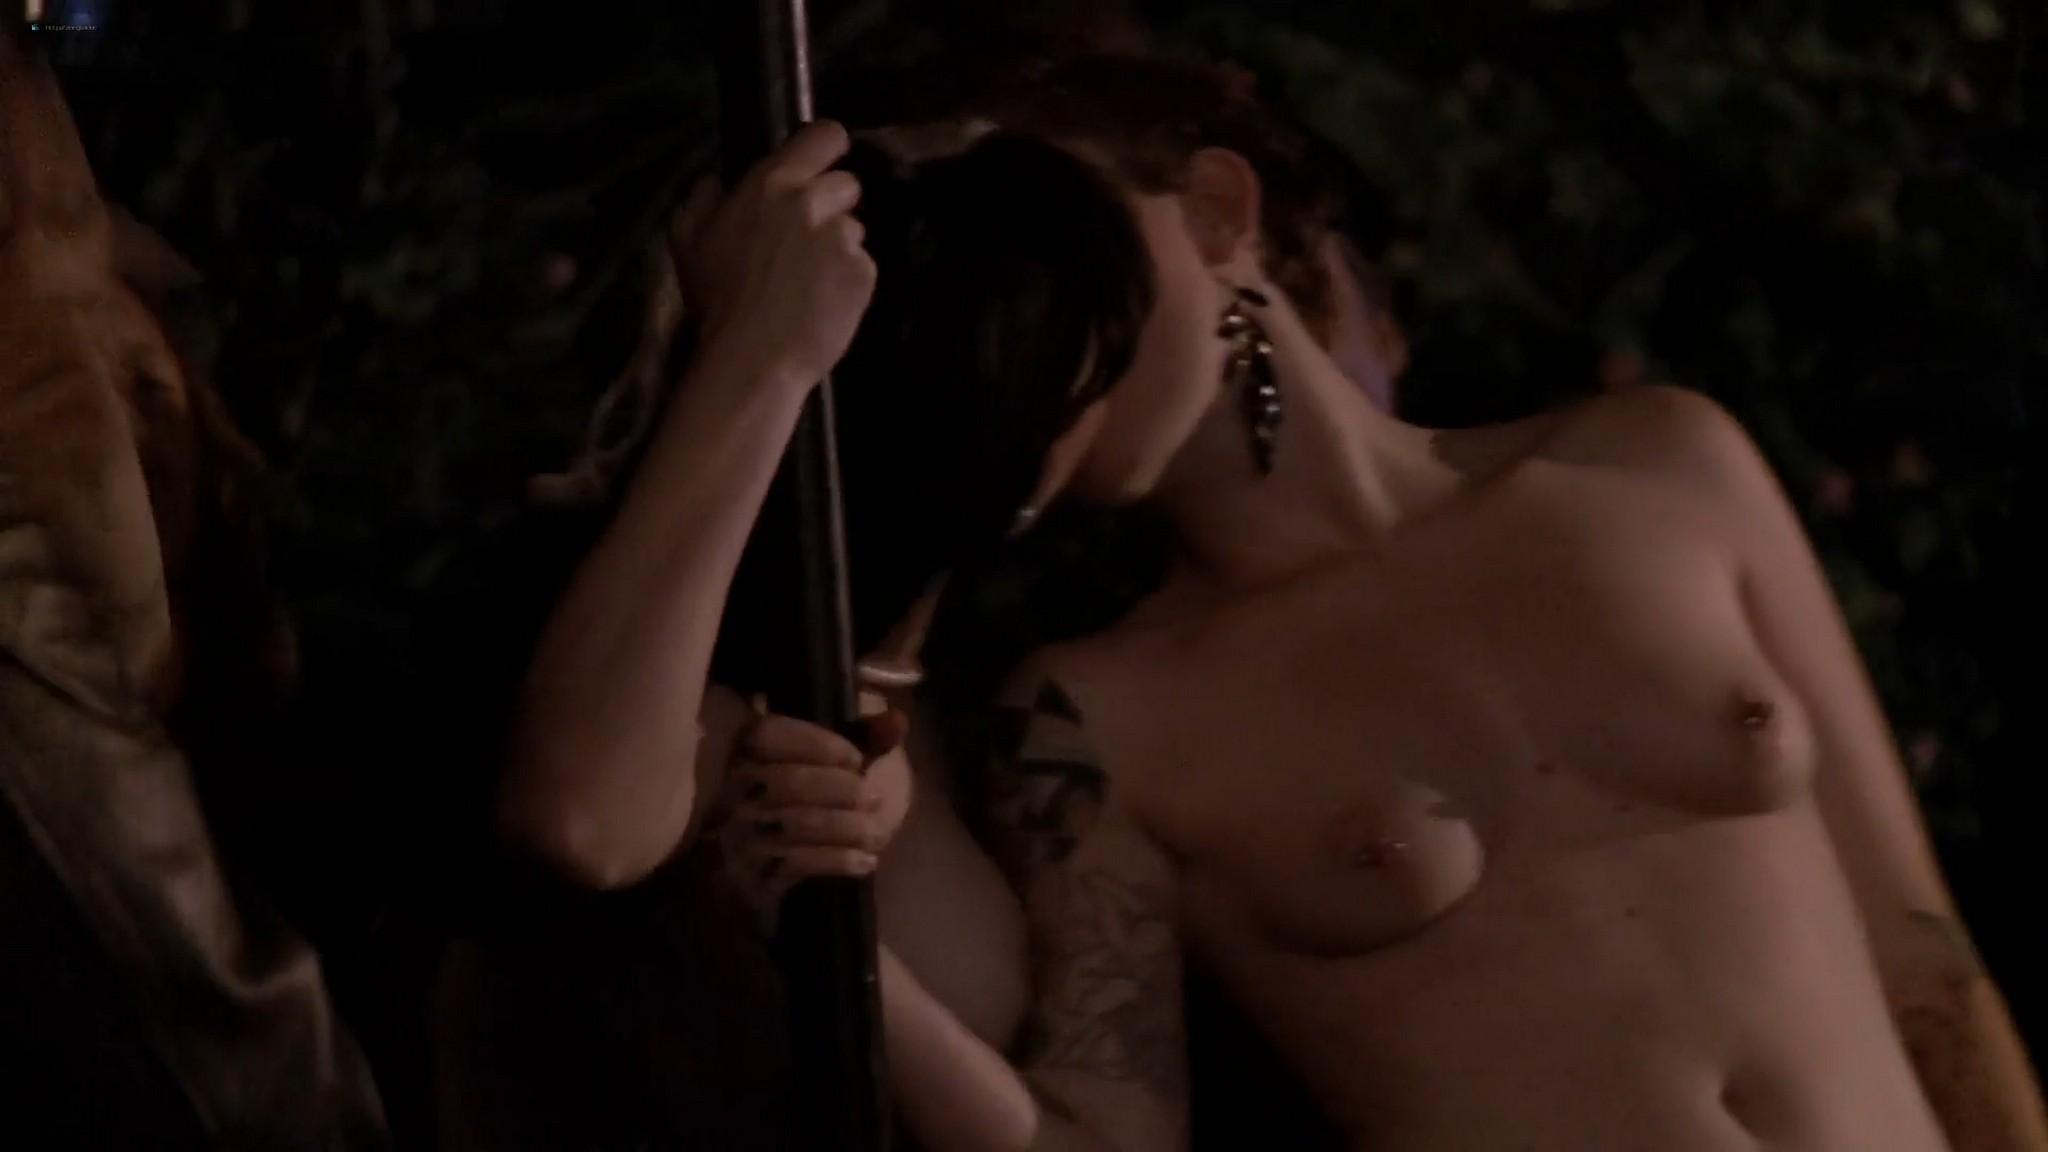 Taylor Cole hot sex Tiffany Shepis Francesca Brandelius naked The Violent Kind 2010 HD 1080p BluRay 010